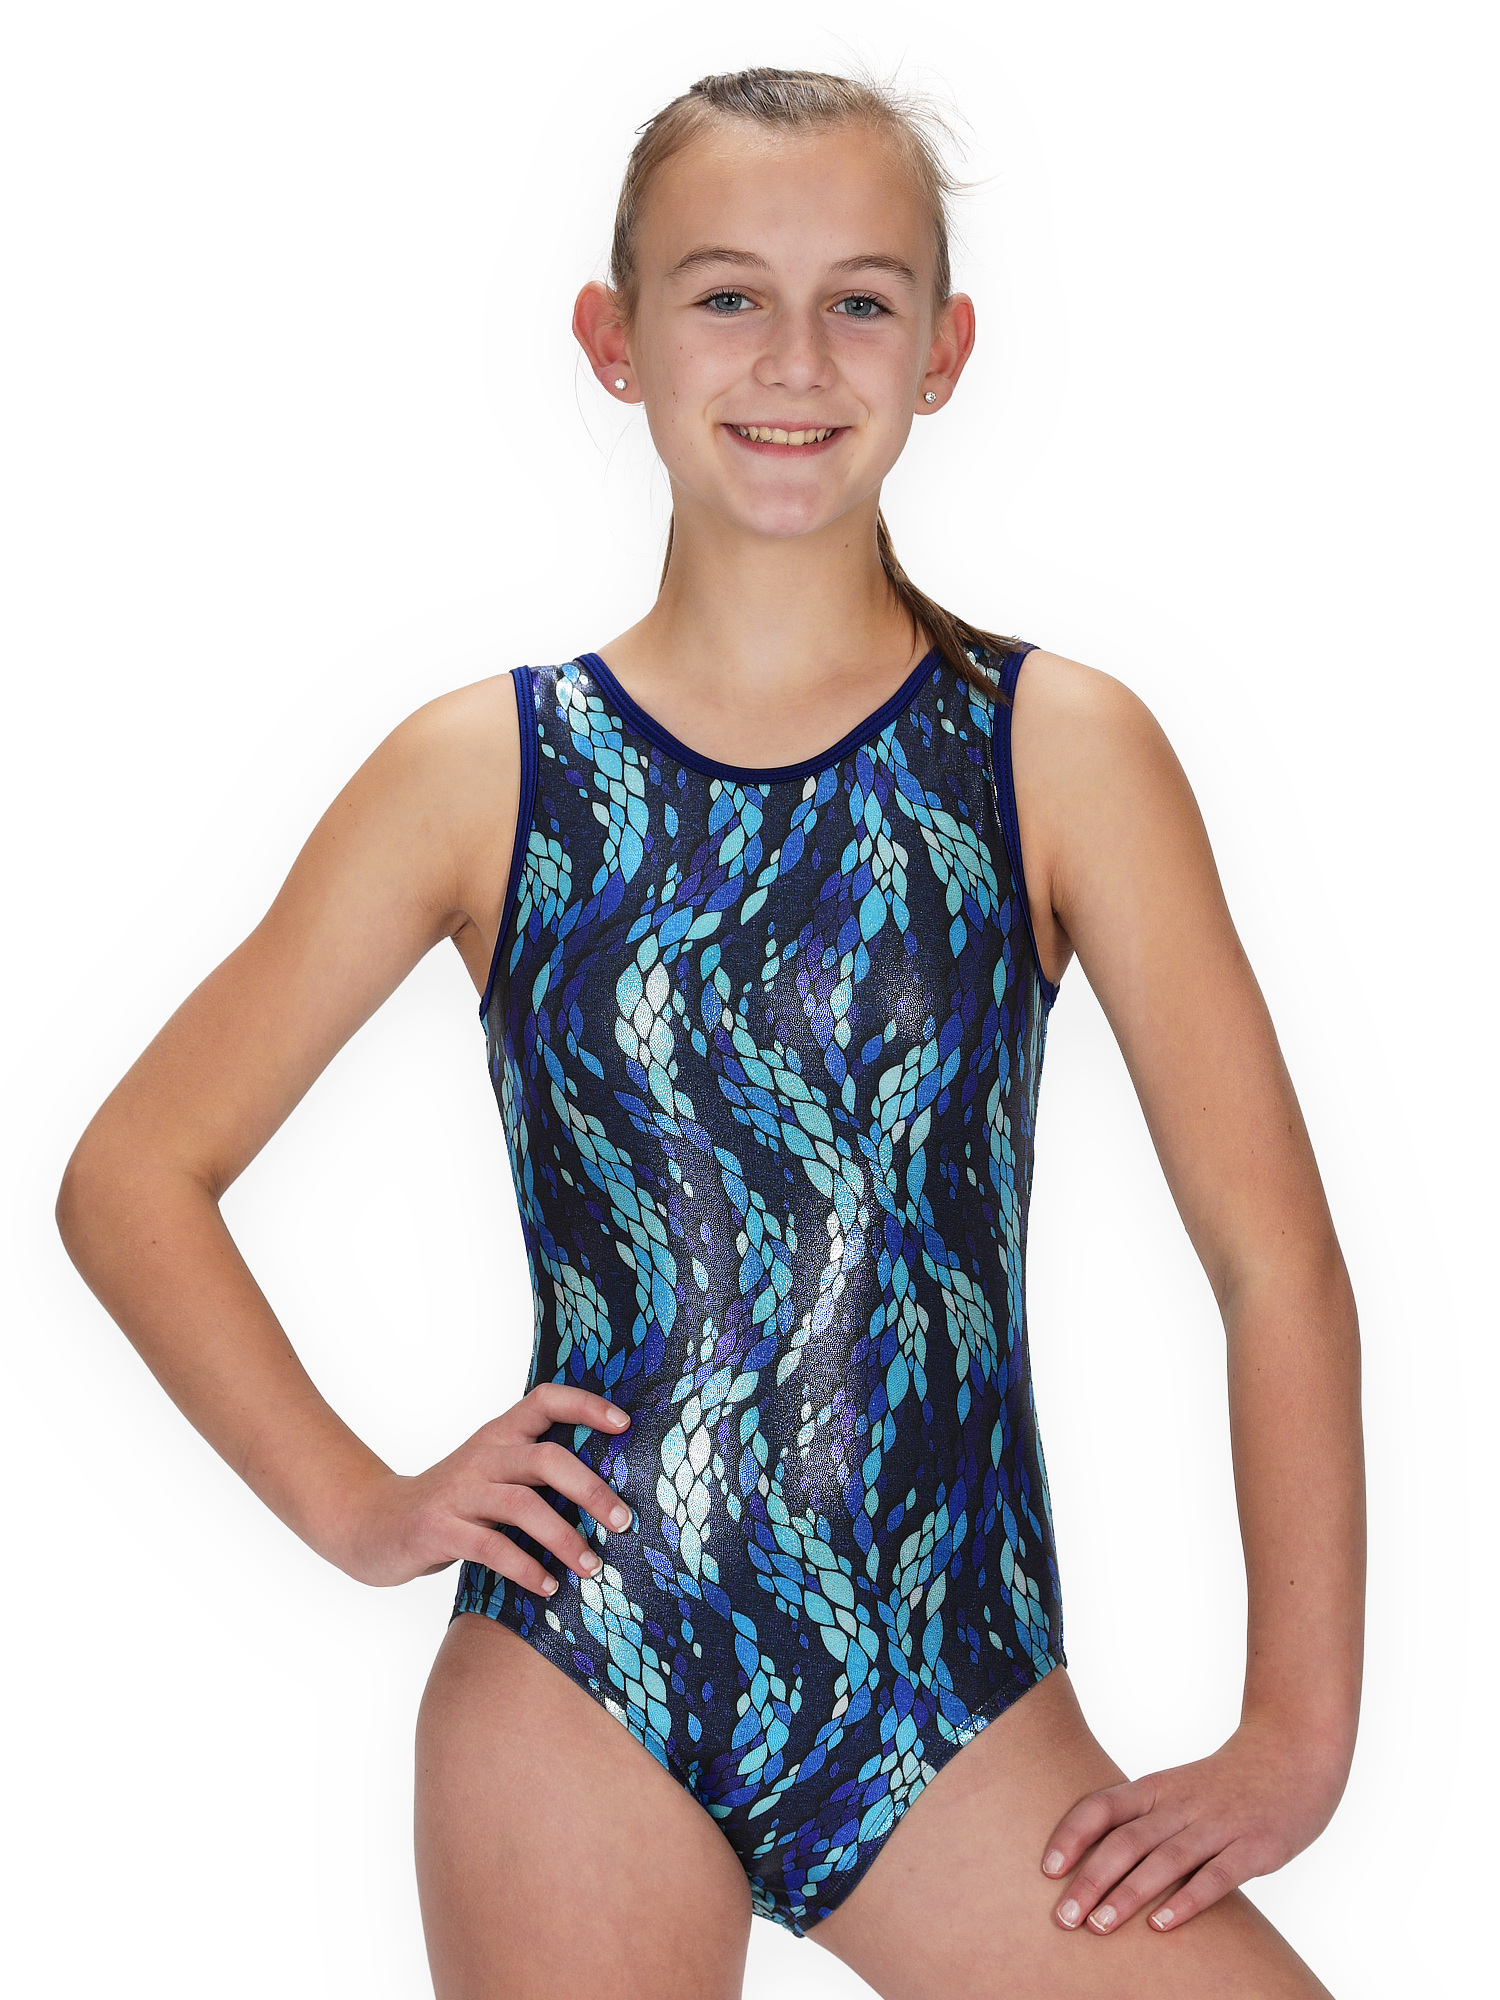 Gymnastics Leotard for Girls - Sea Braids/Jewel - Leap Gear by Pelle - 4 | Child Small